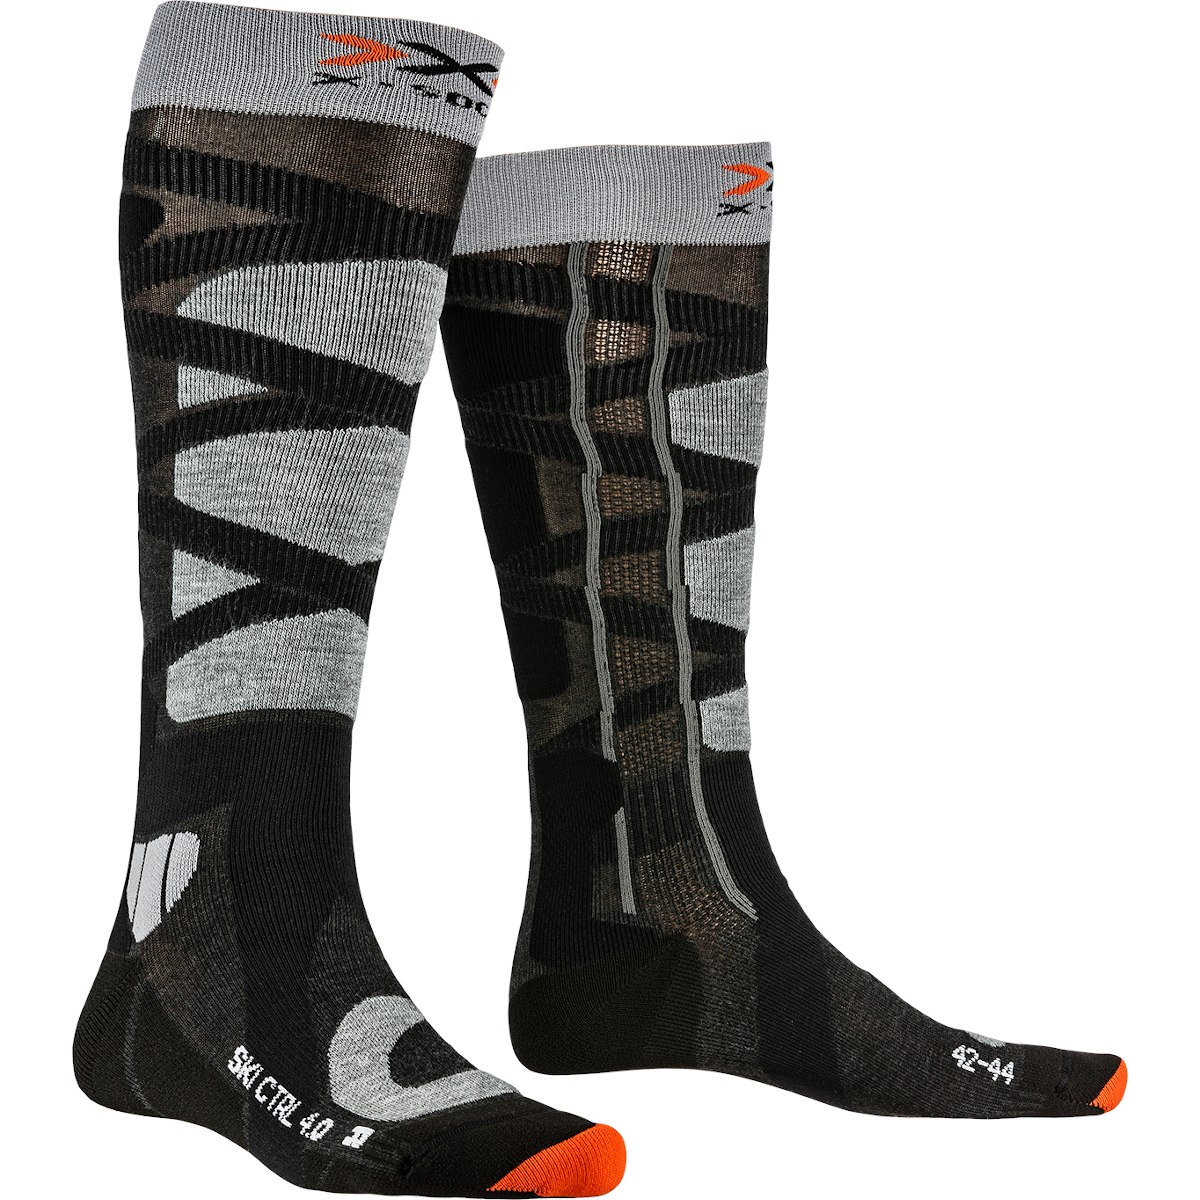 Bild von X-Socks Ski Control 4.0 Socken - anthracite melange/stone grey melange